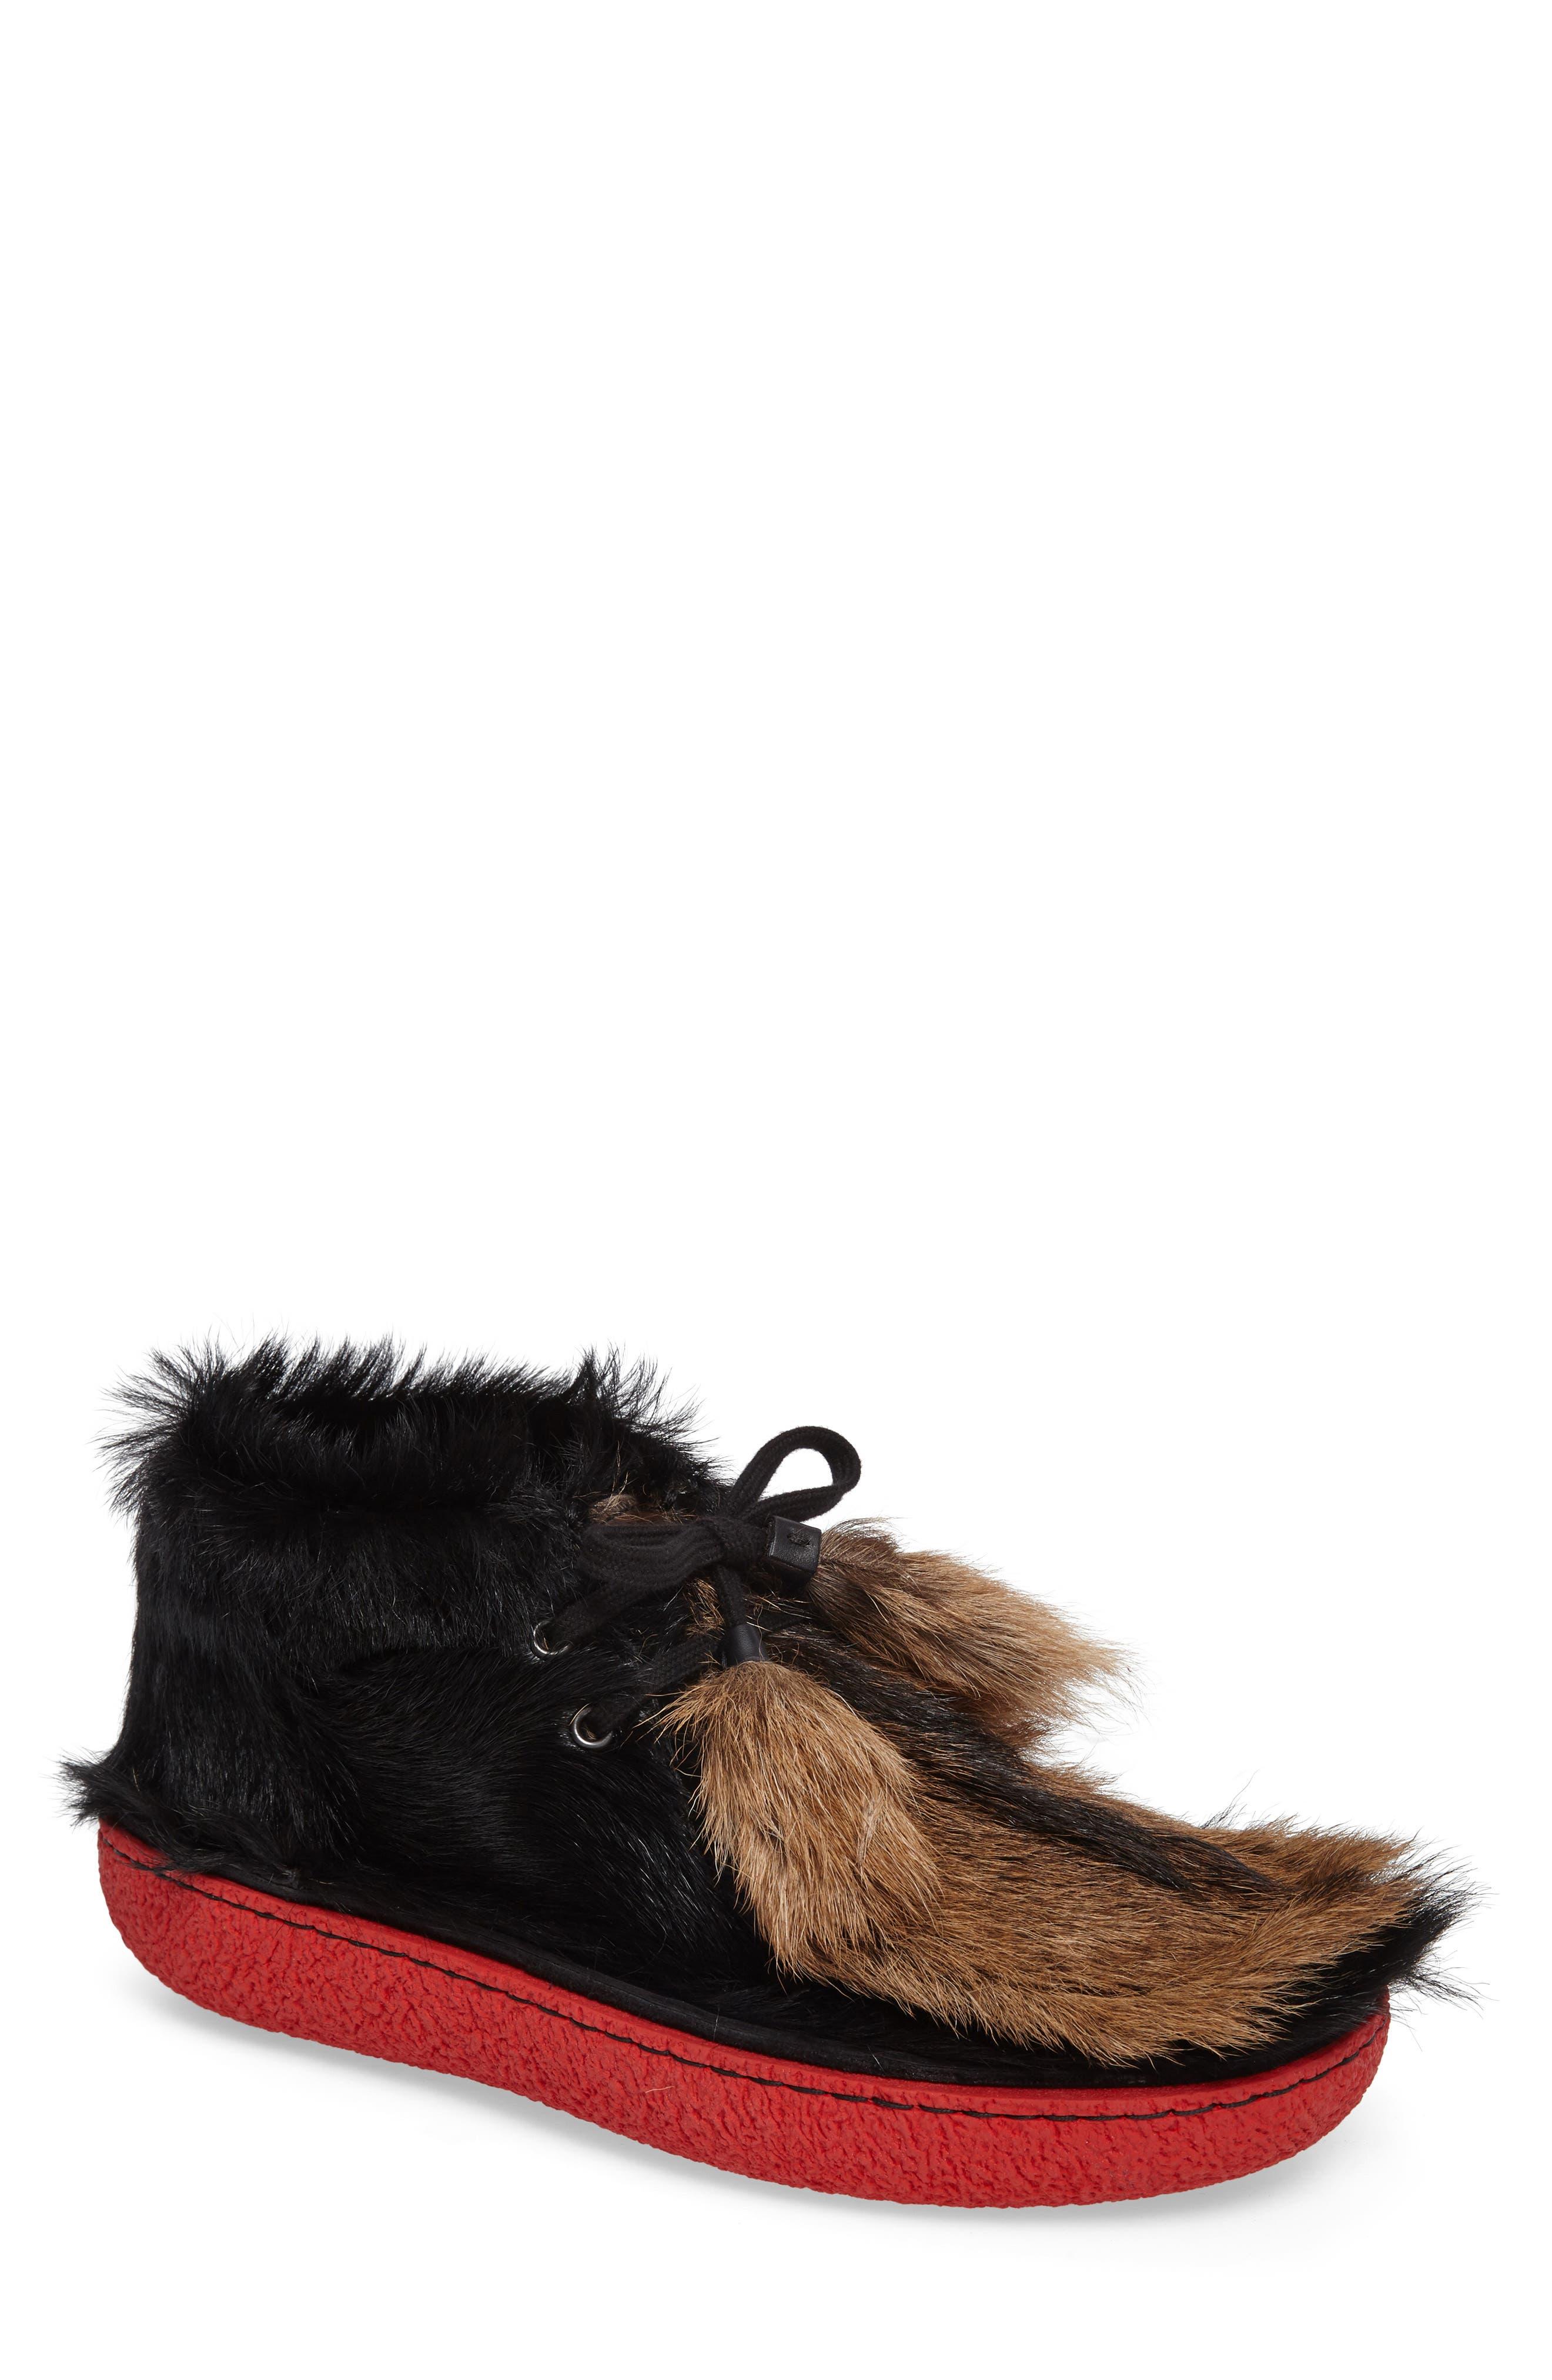 Genuine Calf and Goat Hair Chukka Boot,                             Main thumbnail 1, color,                             Nero Multi